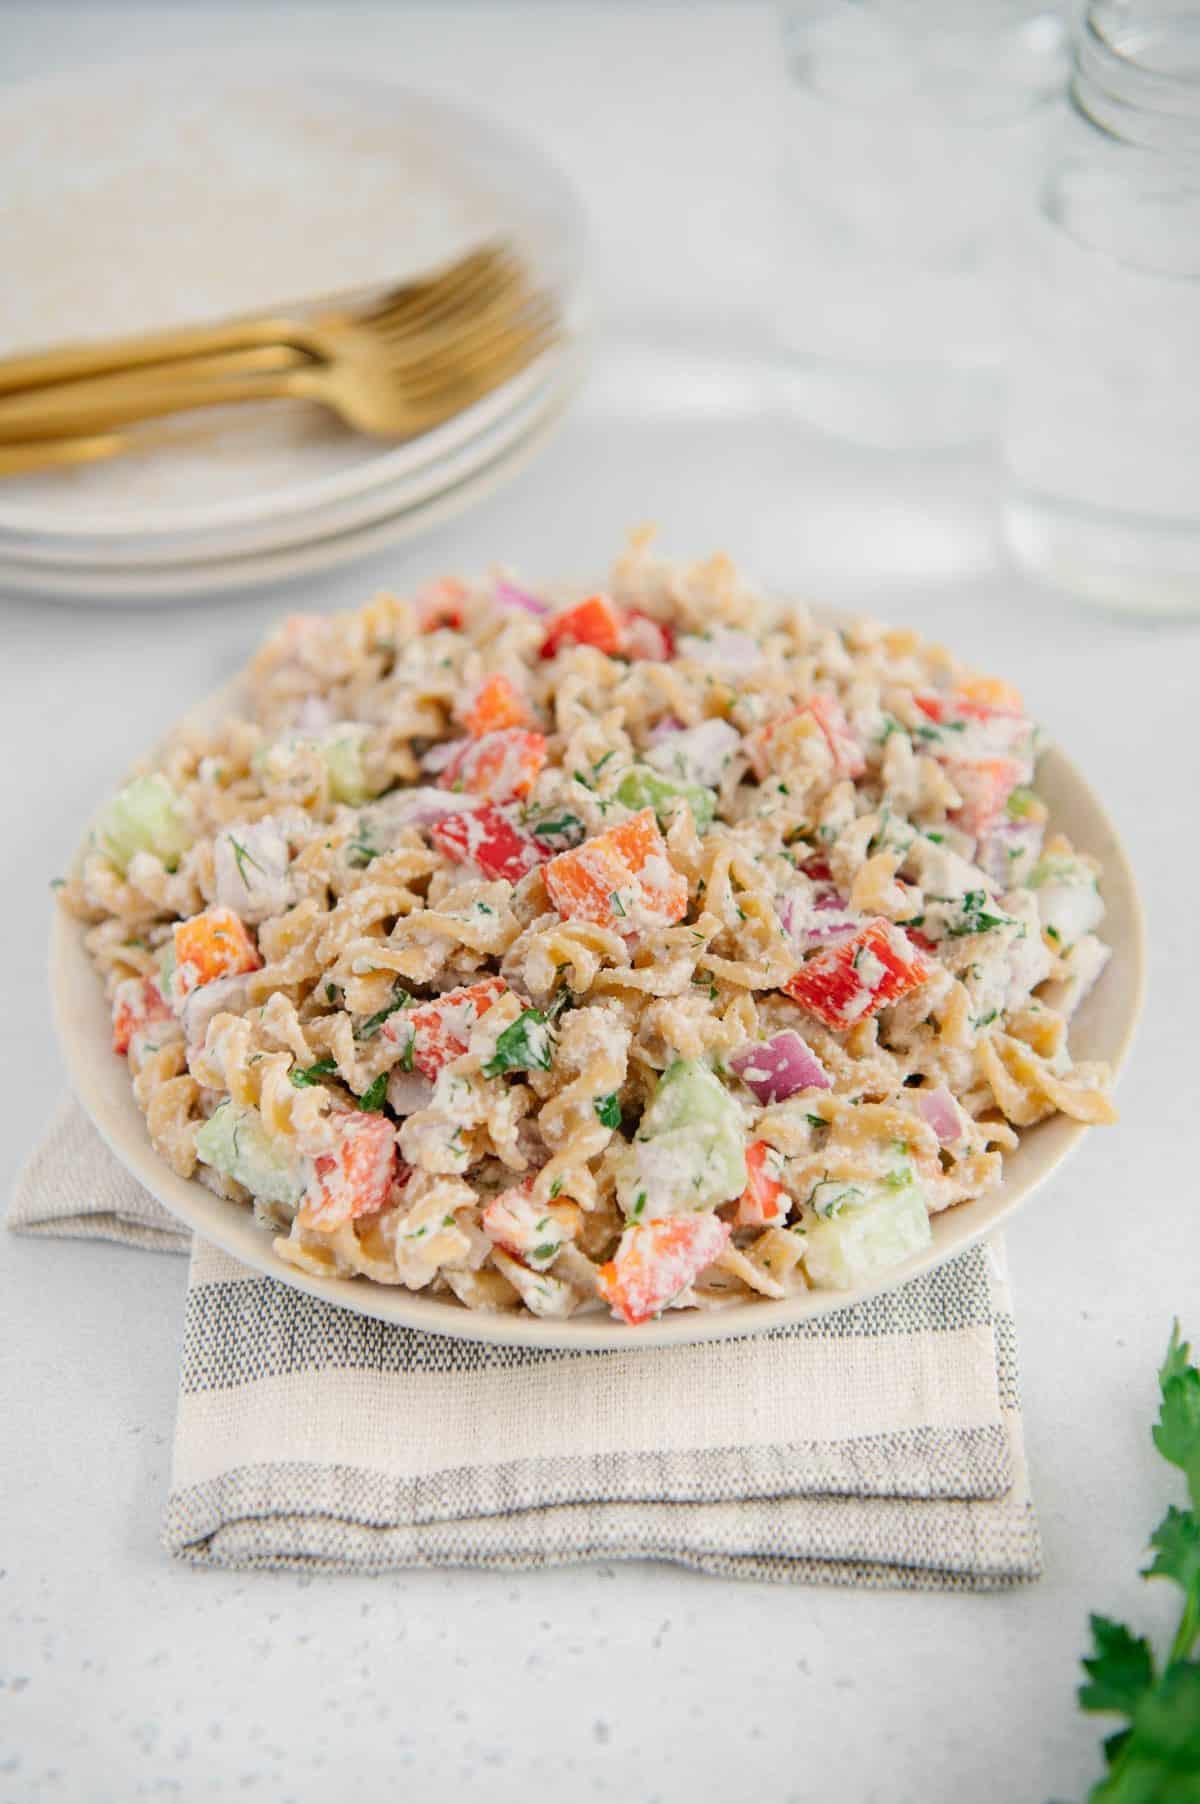 Gluten-Free Vegan Pasta Salad